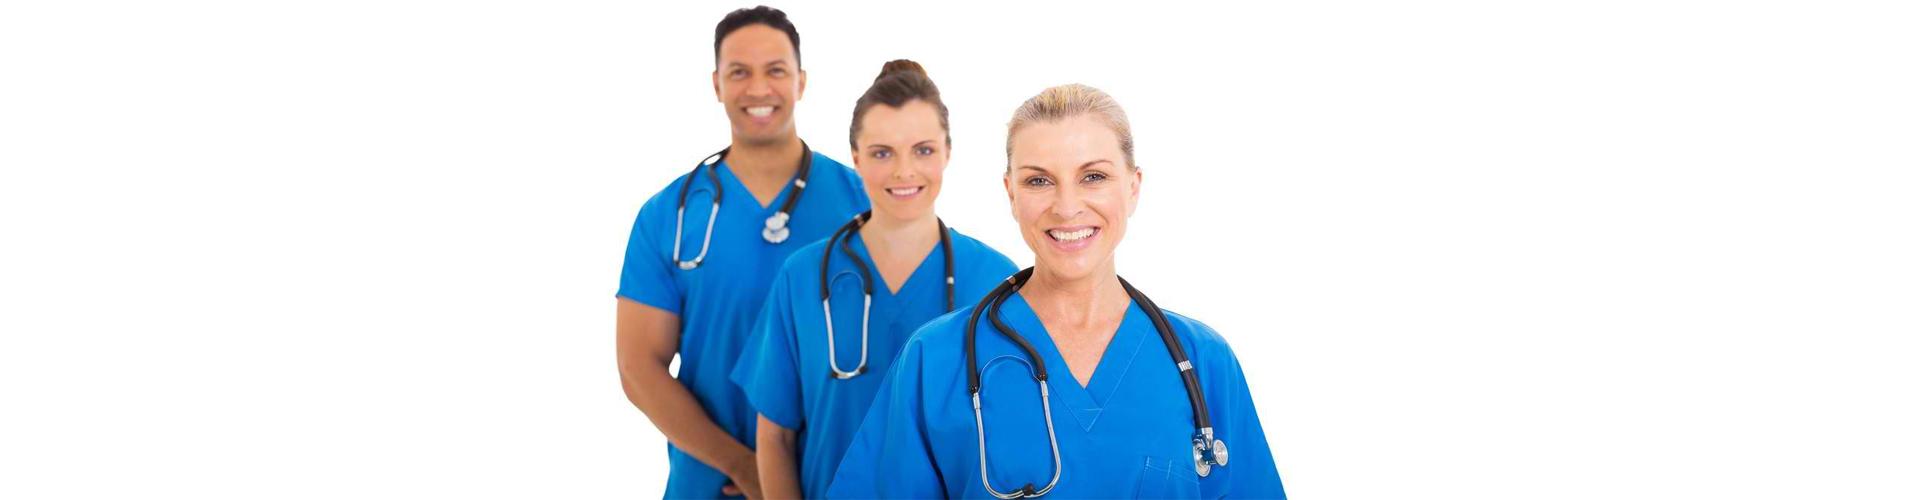 group of nurse smiling